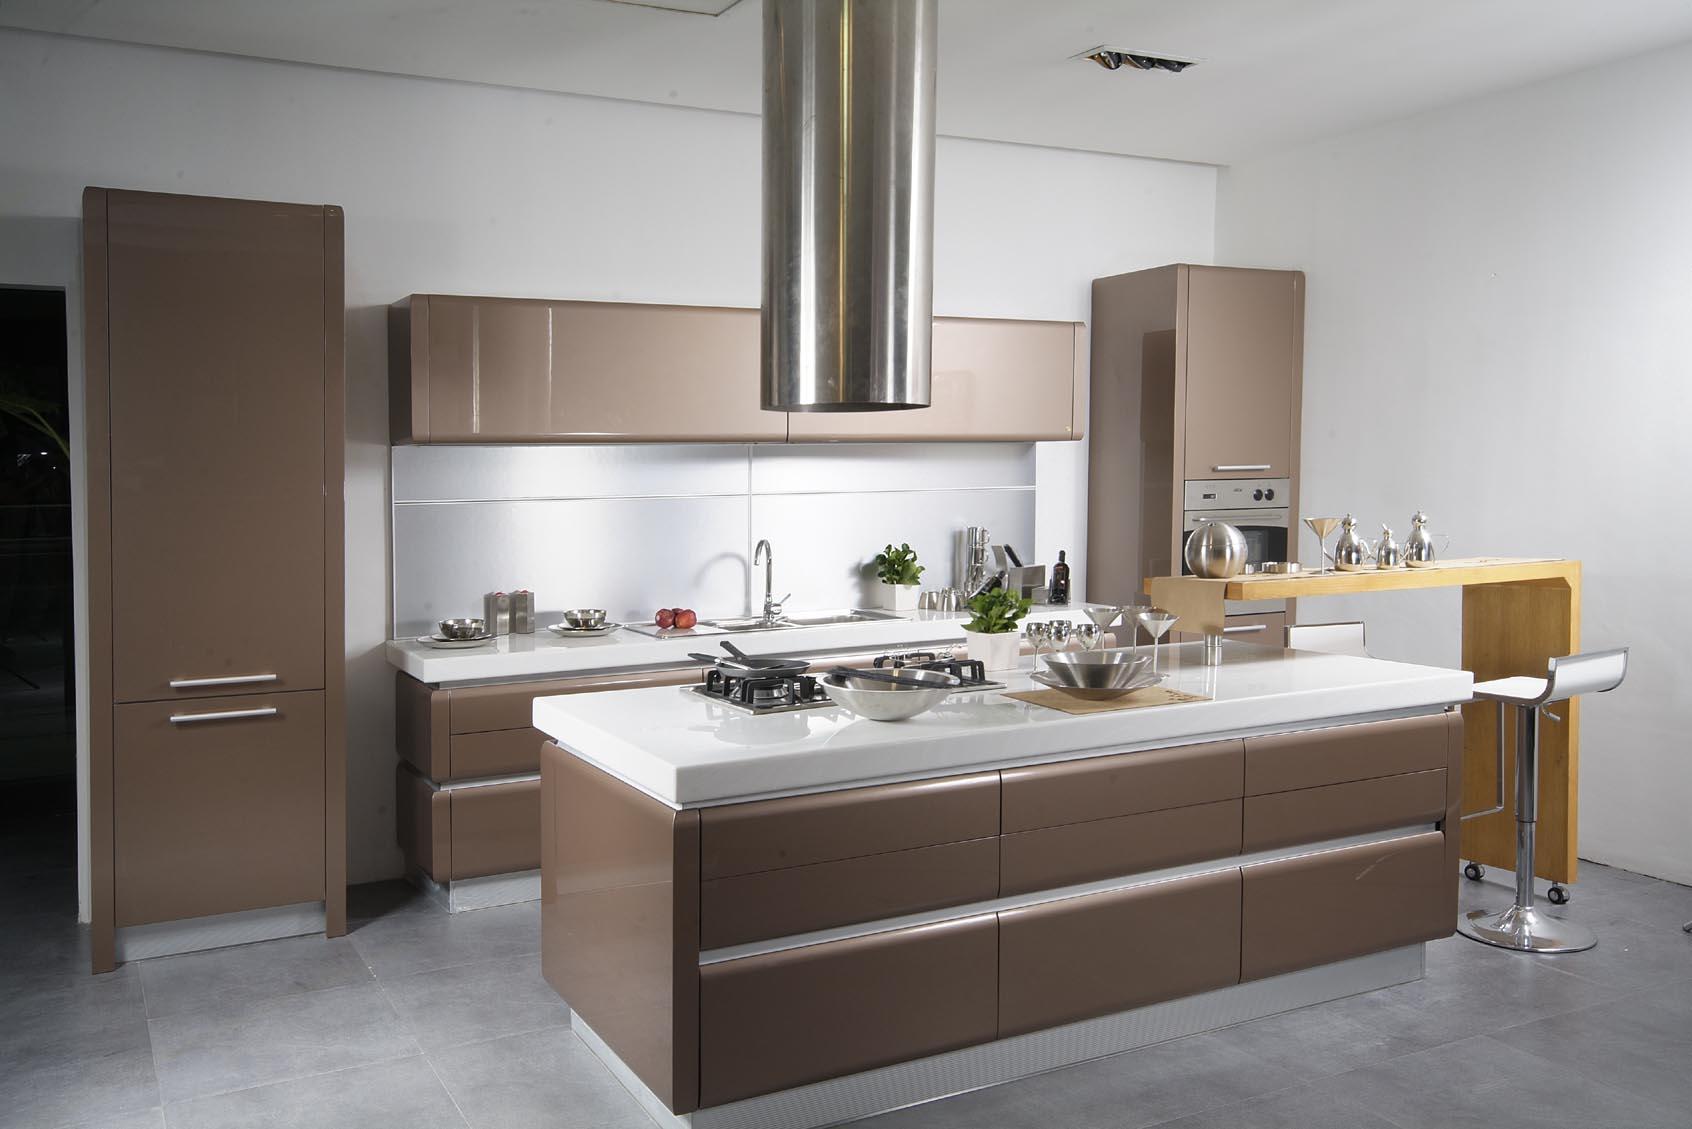 30 Modern Kitchen Design Ideas - The WoW Style on Modern Kitchen Design Ideas  id=81844